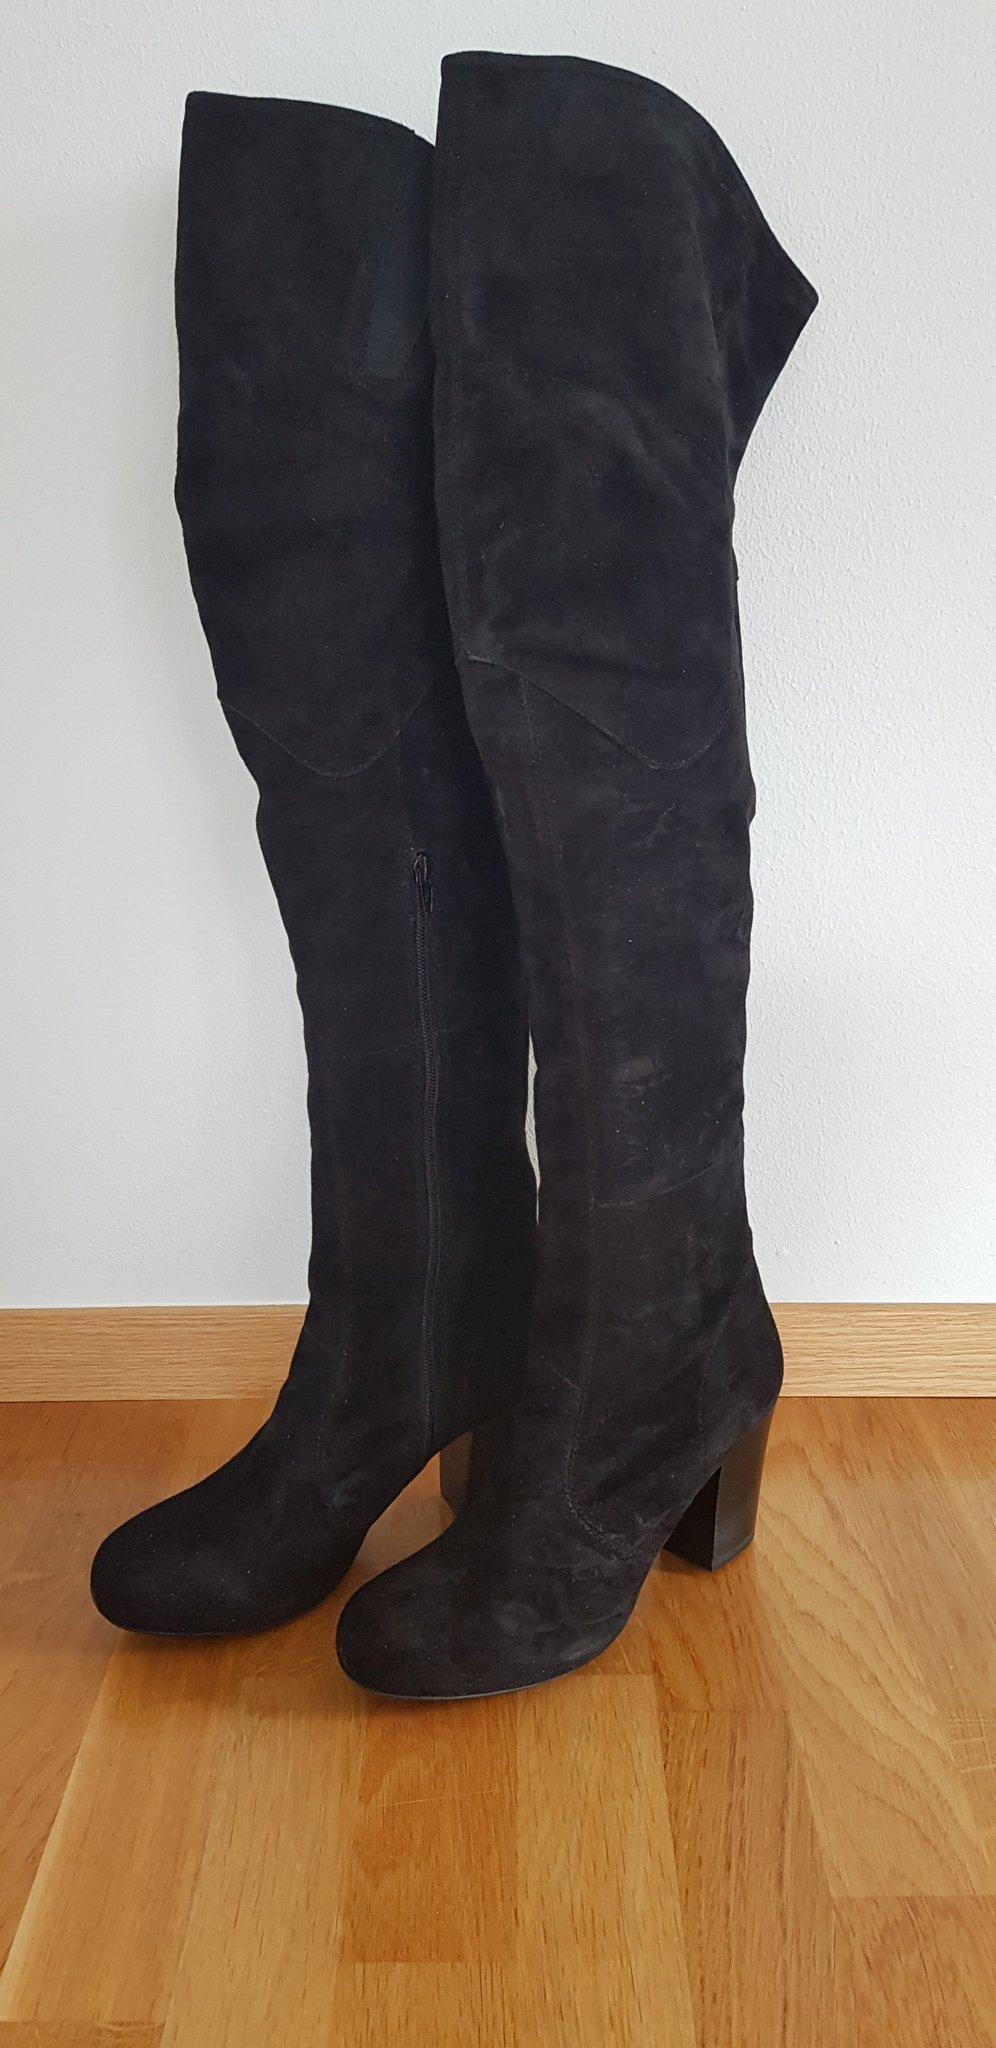 Vagabond Lårhöga Mocka Boots i storlek 41 (367025319) ᐈ Köp